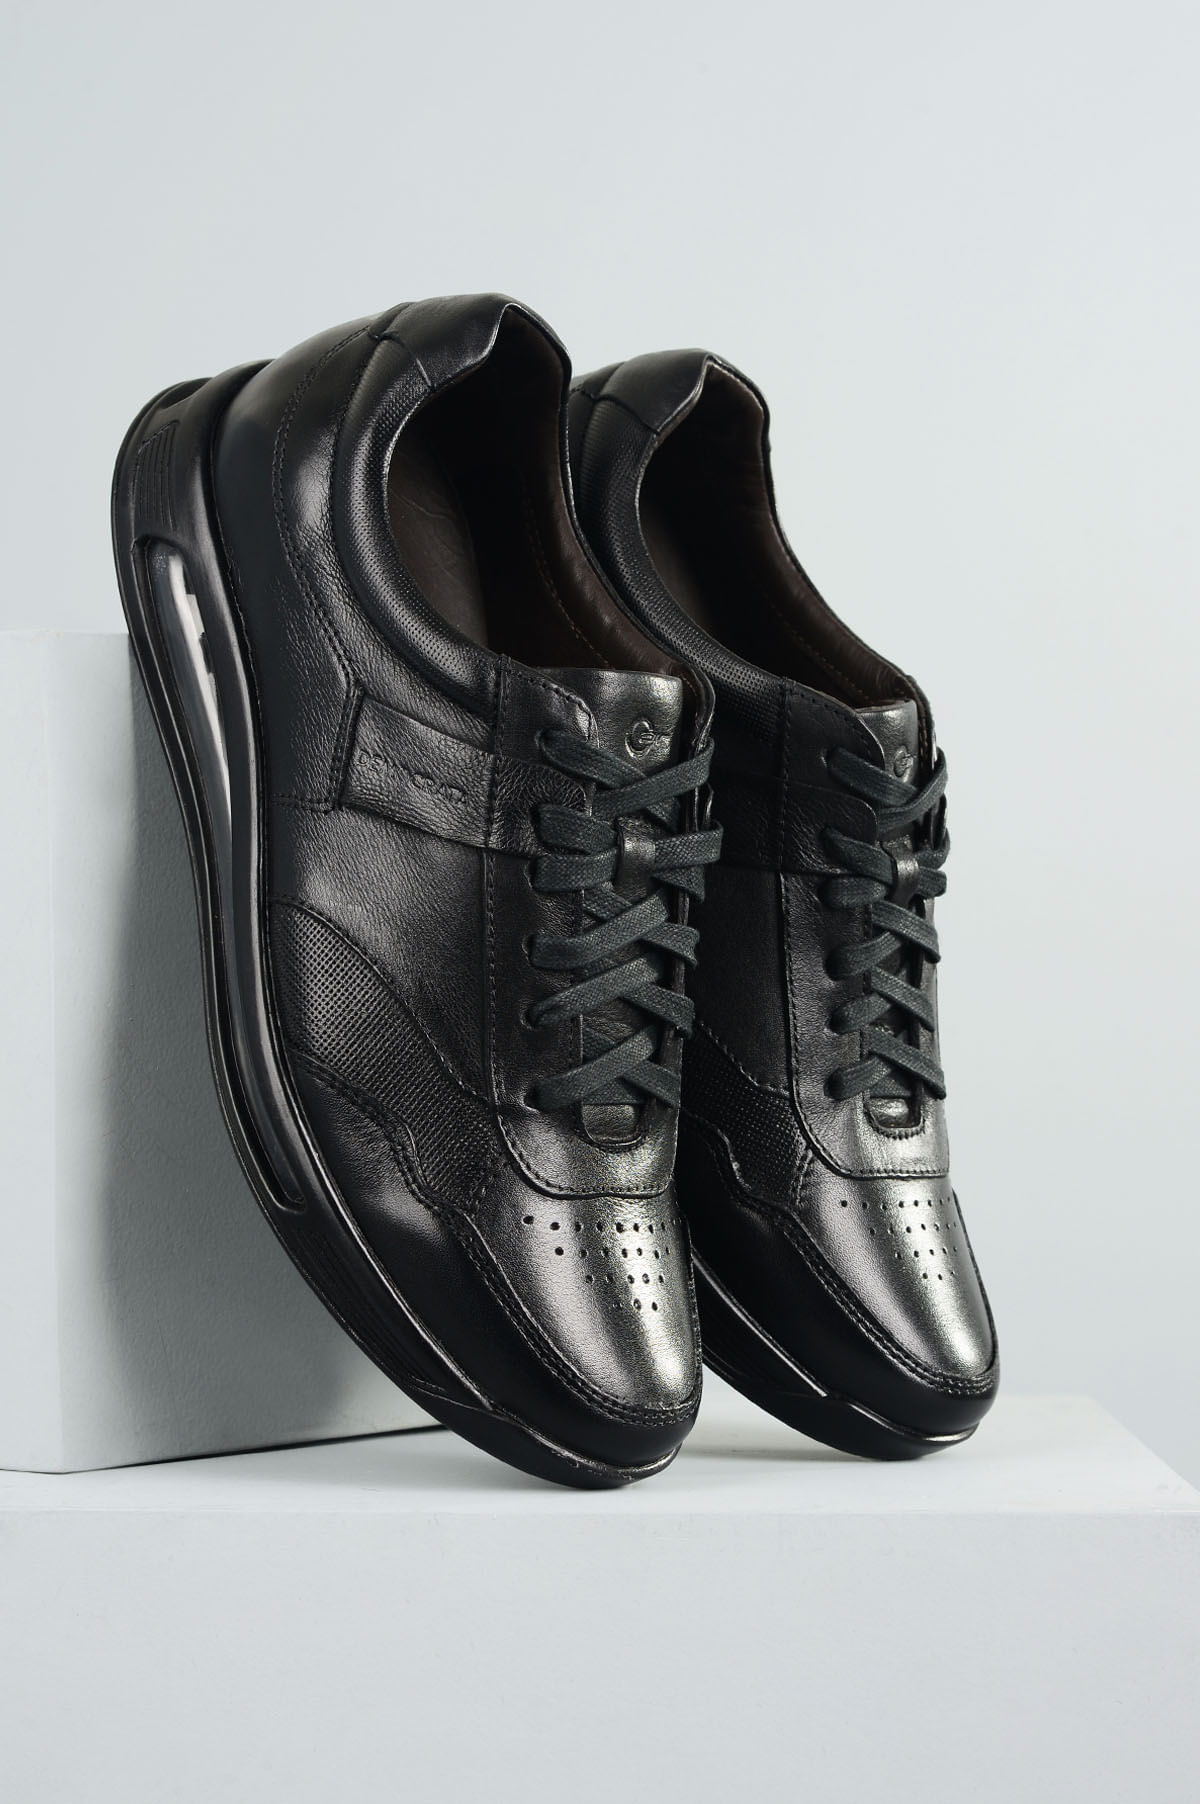 7312204393 Sapato Masculino Democrata Air 360 CR-PRETO - Mundial Calçados